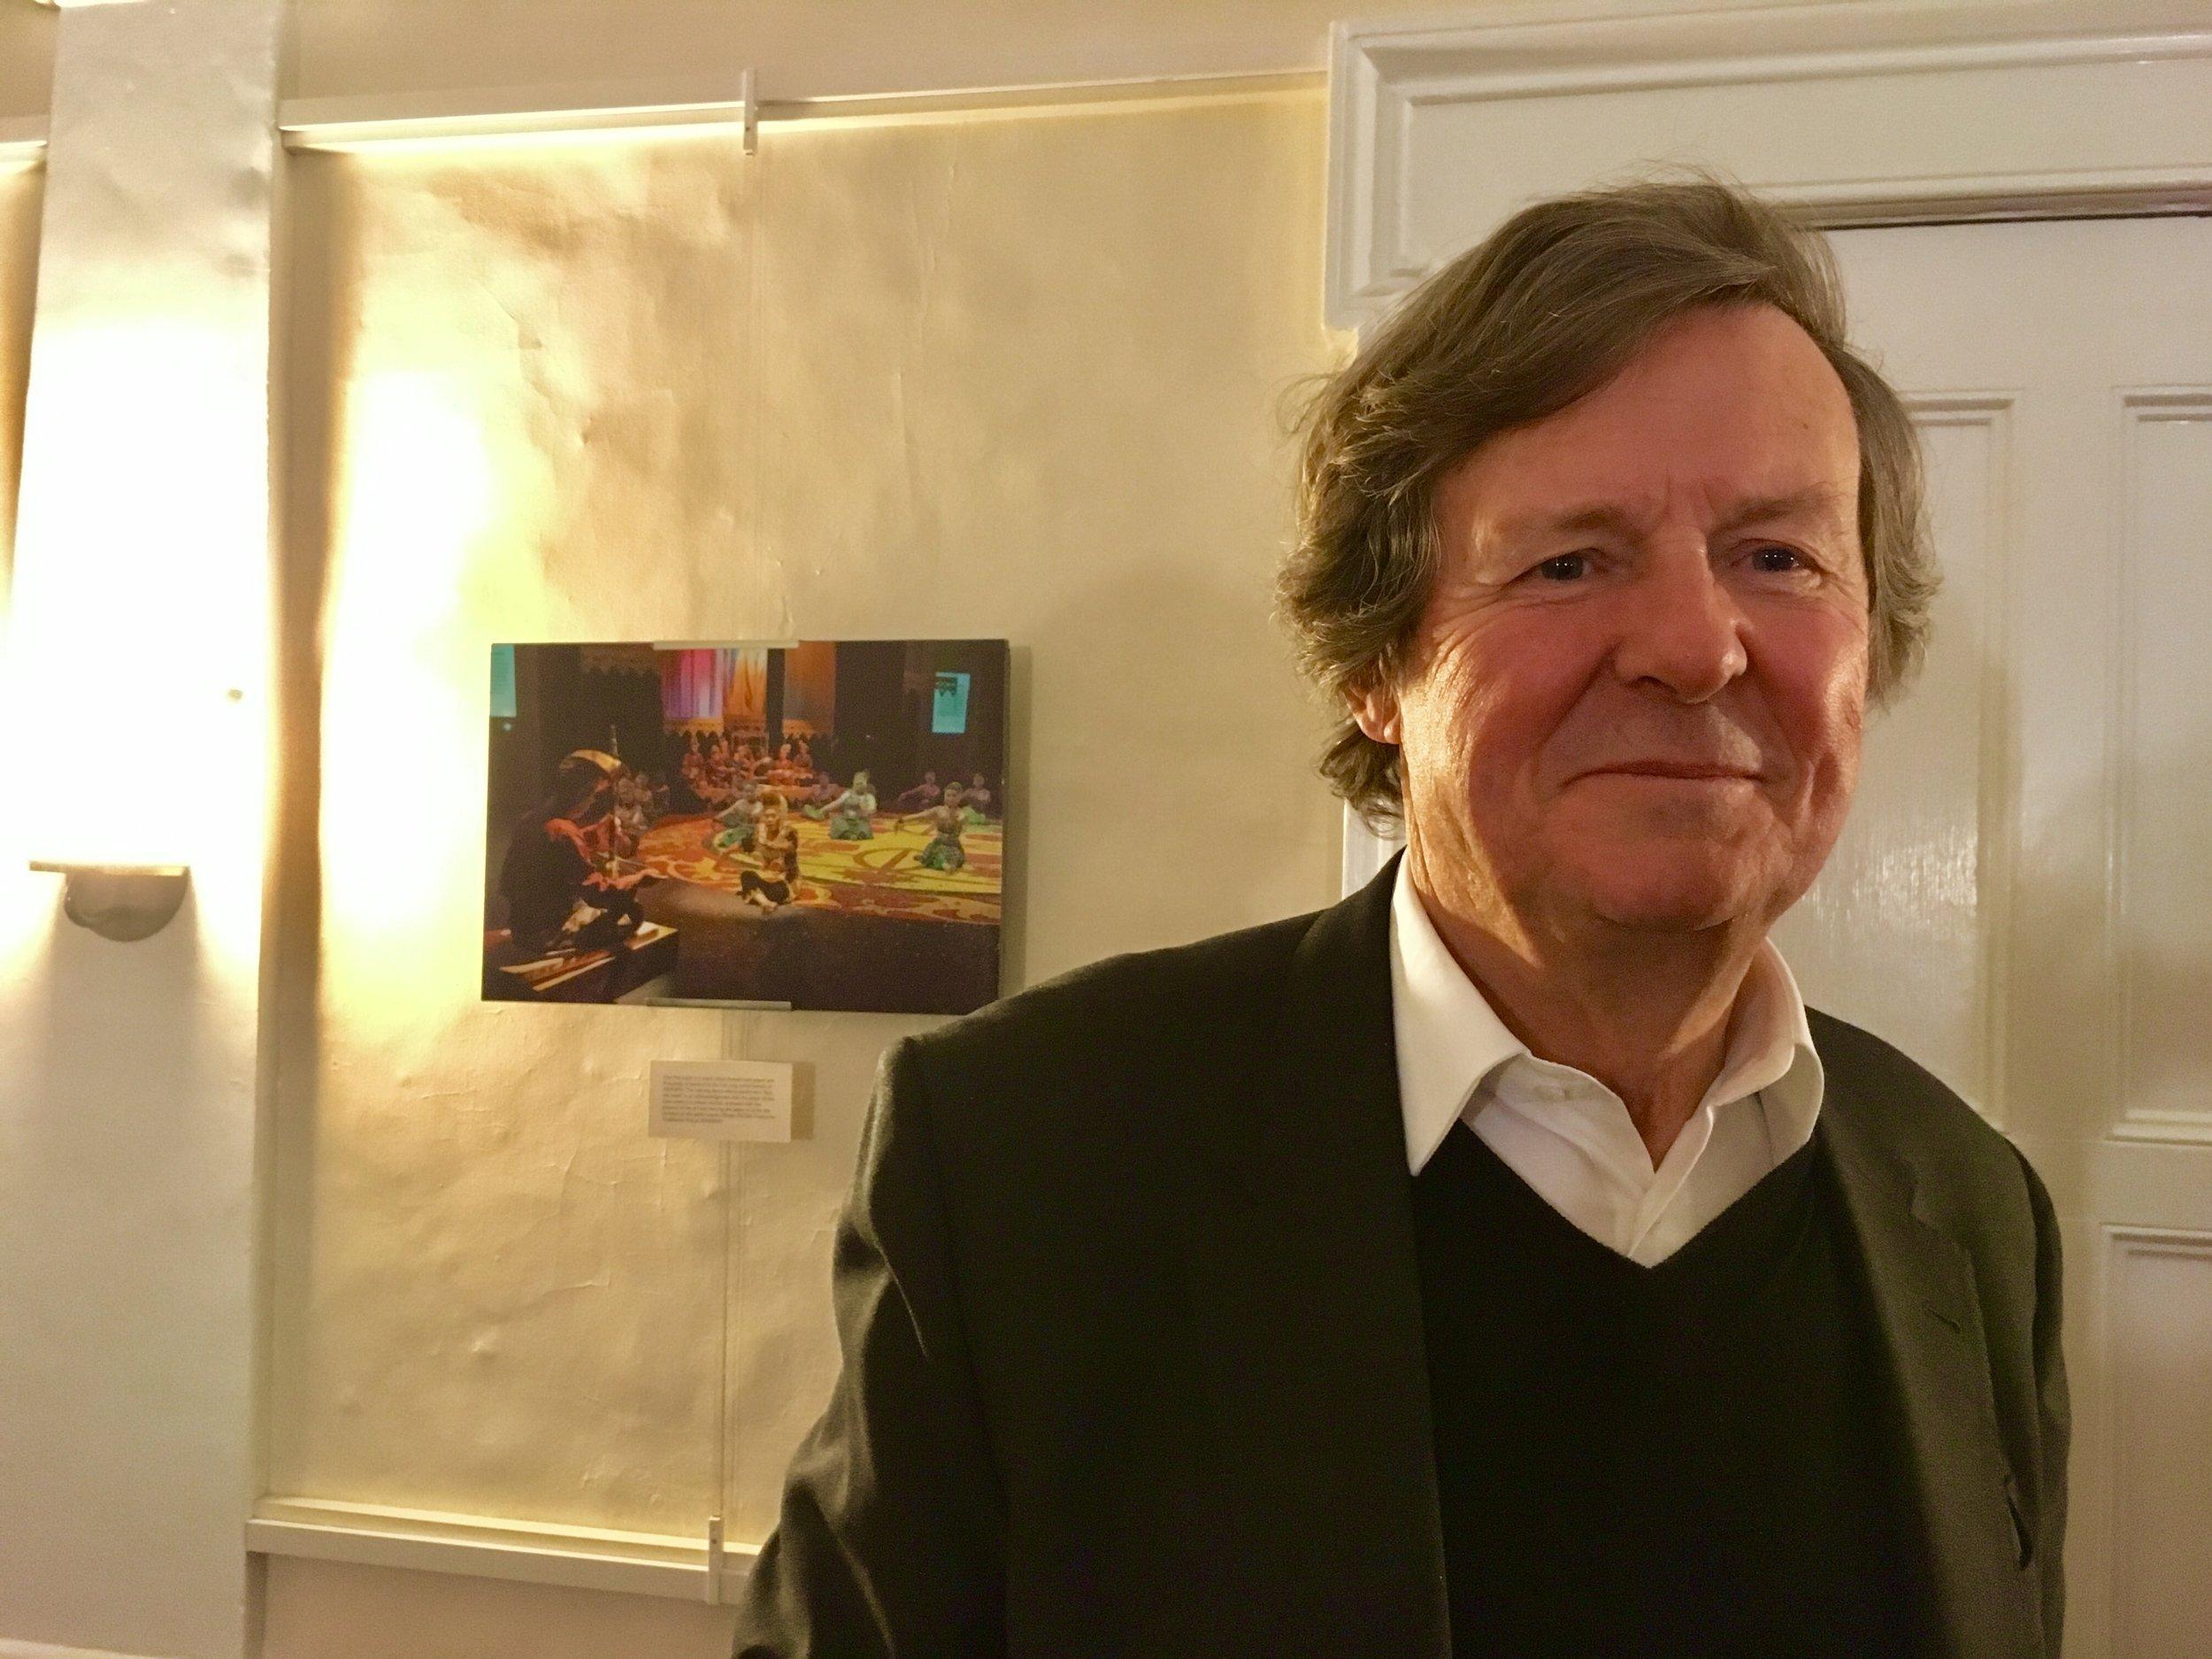 Playwright David Hare